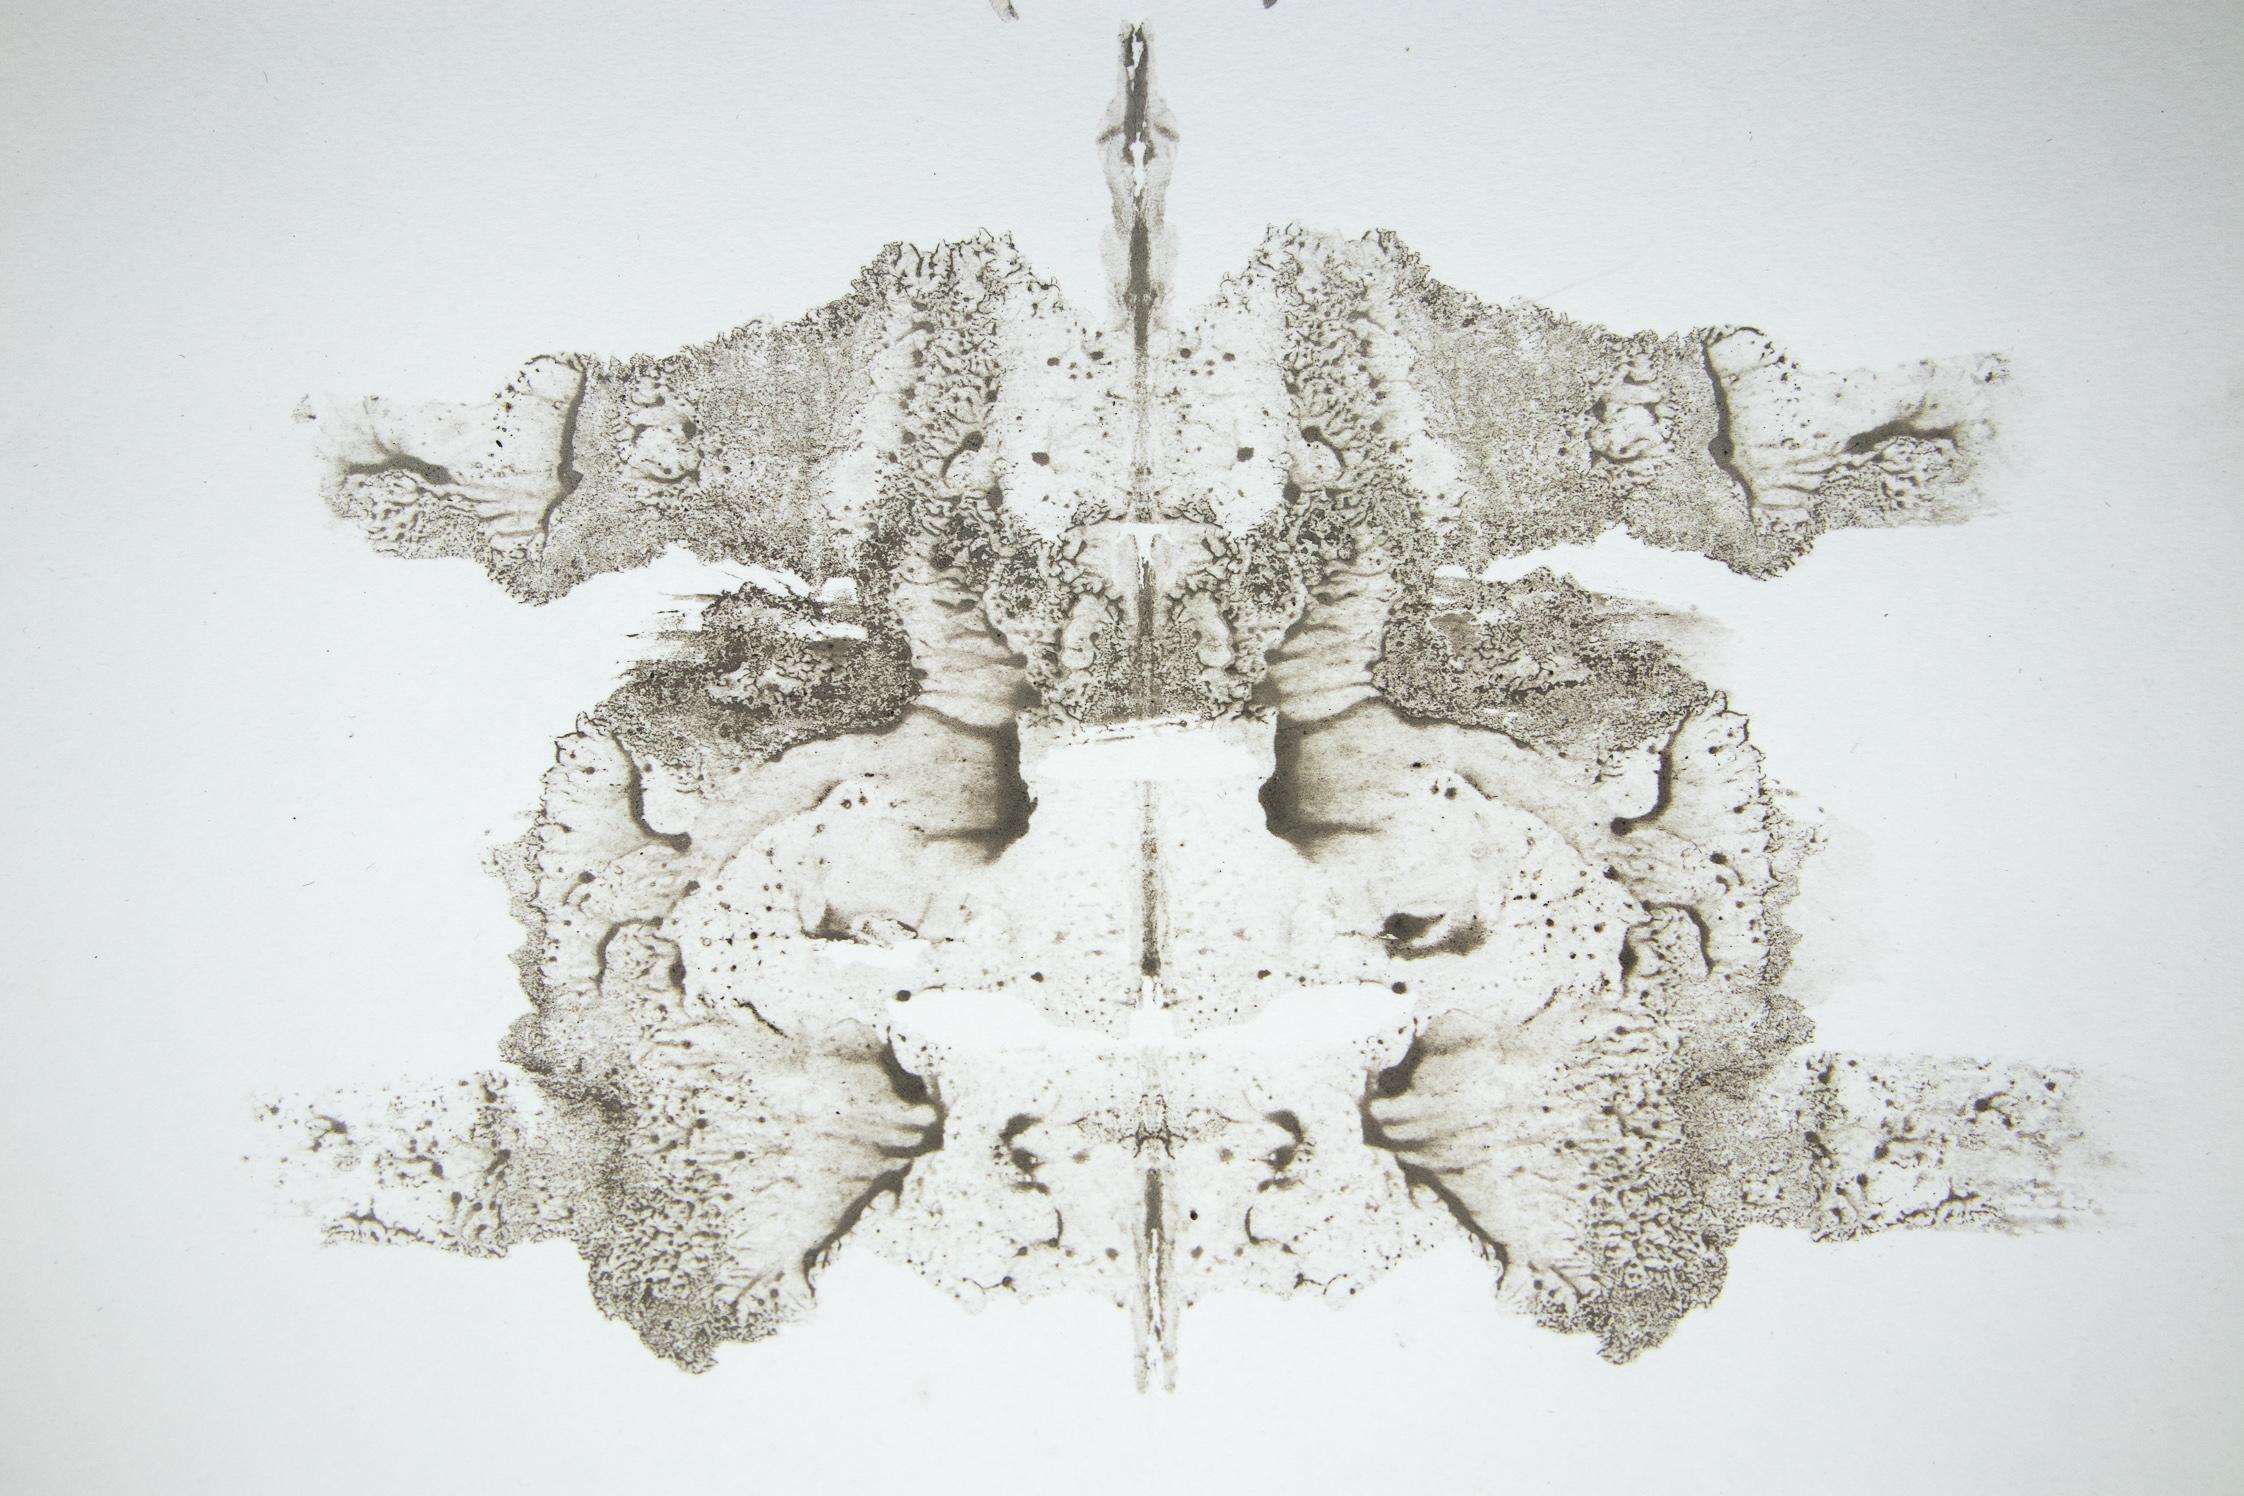 Seicodiagnostig Merched Chwarel - Slate Dust Rorschach blot, 2018